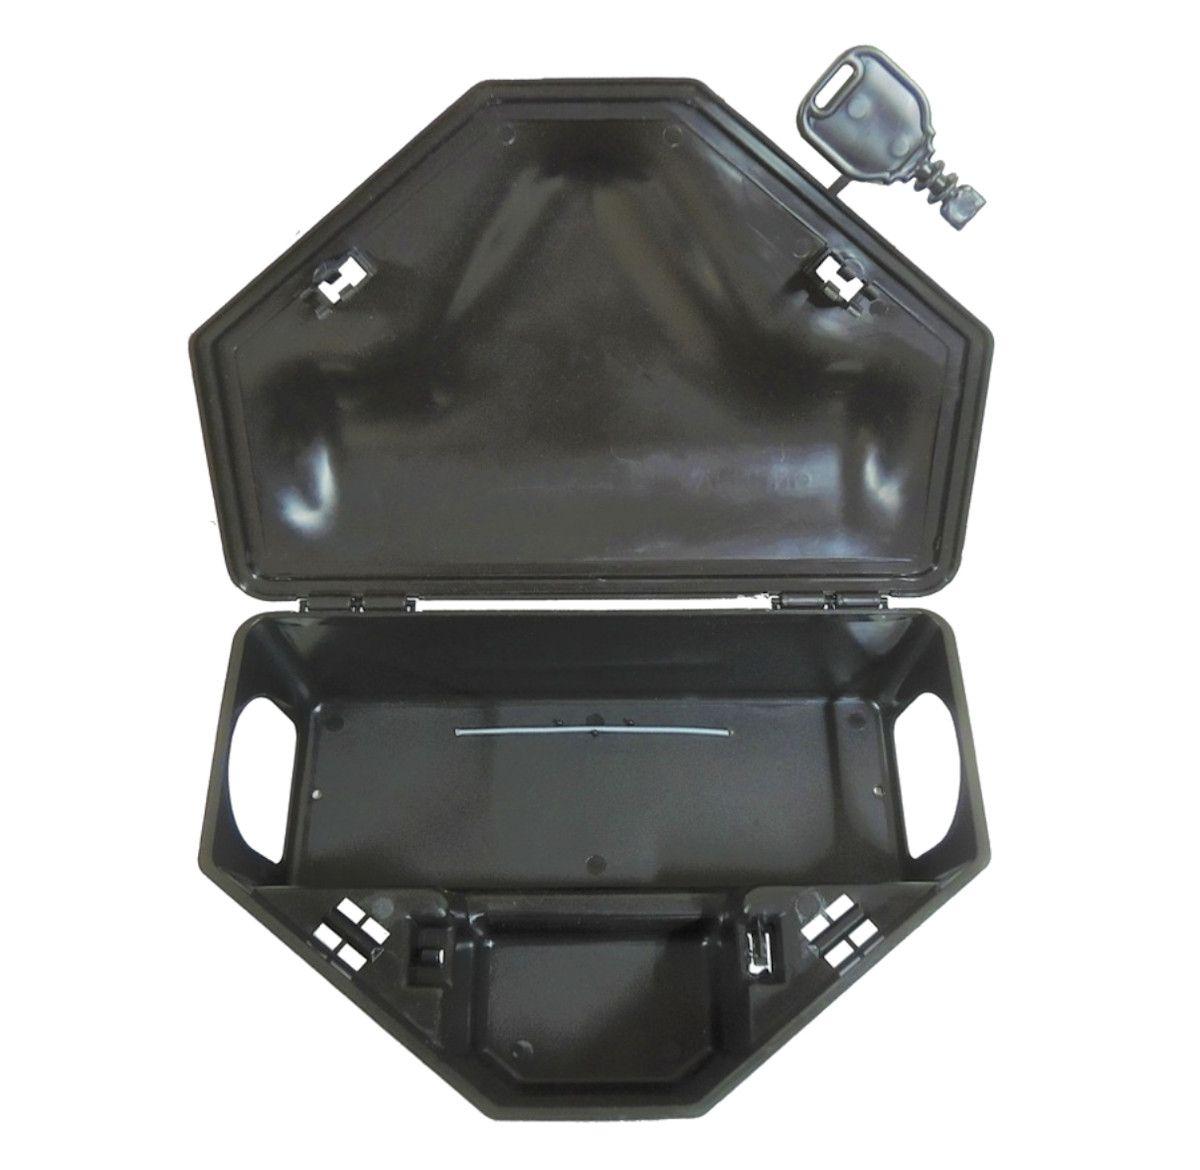 kit 54 Porta Iscas com travamento duplo - mata rato, ratoeira